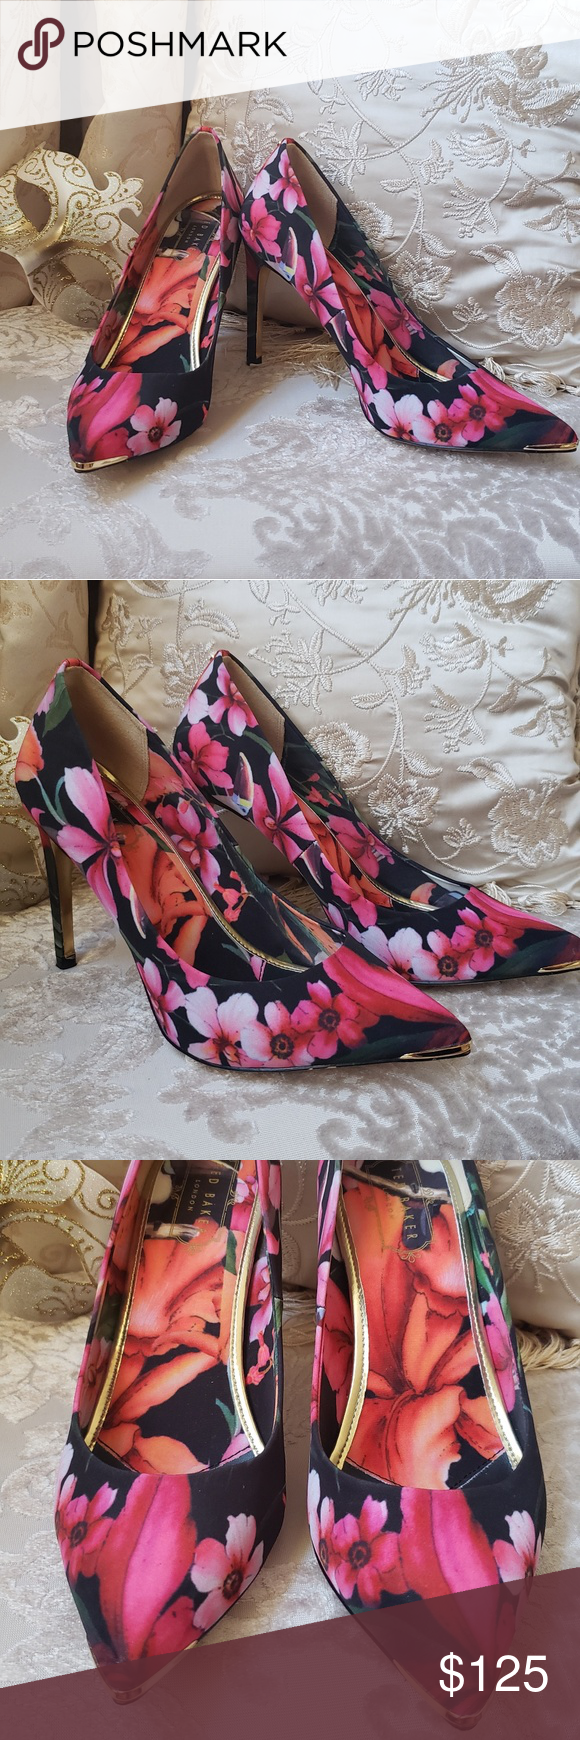 c6650b2ef0dfc7 Ted Baker- Hawaiian Heels Ted Baker London Hawaiian Print Heels. These are  absolutely stunning